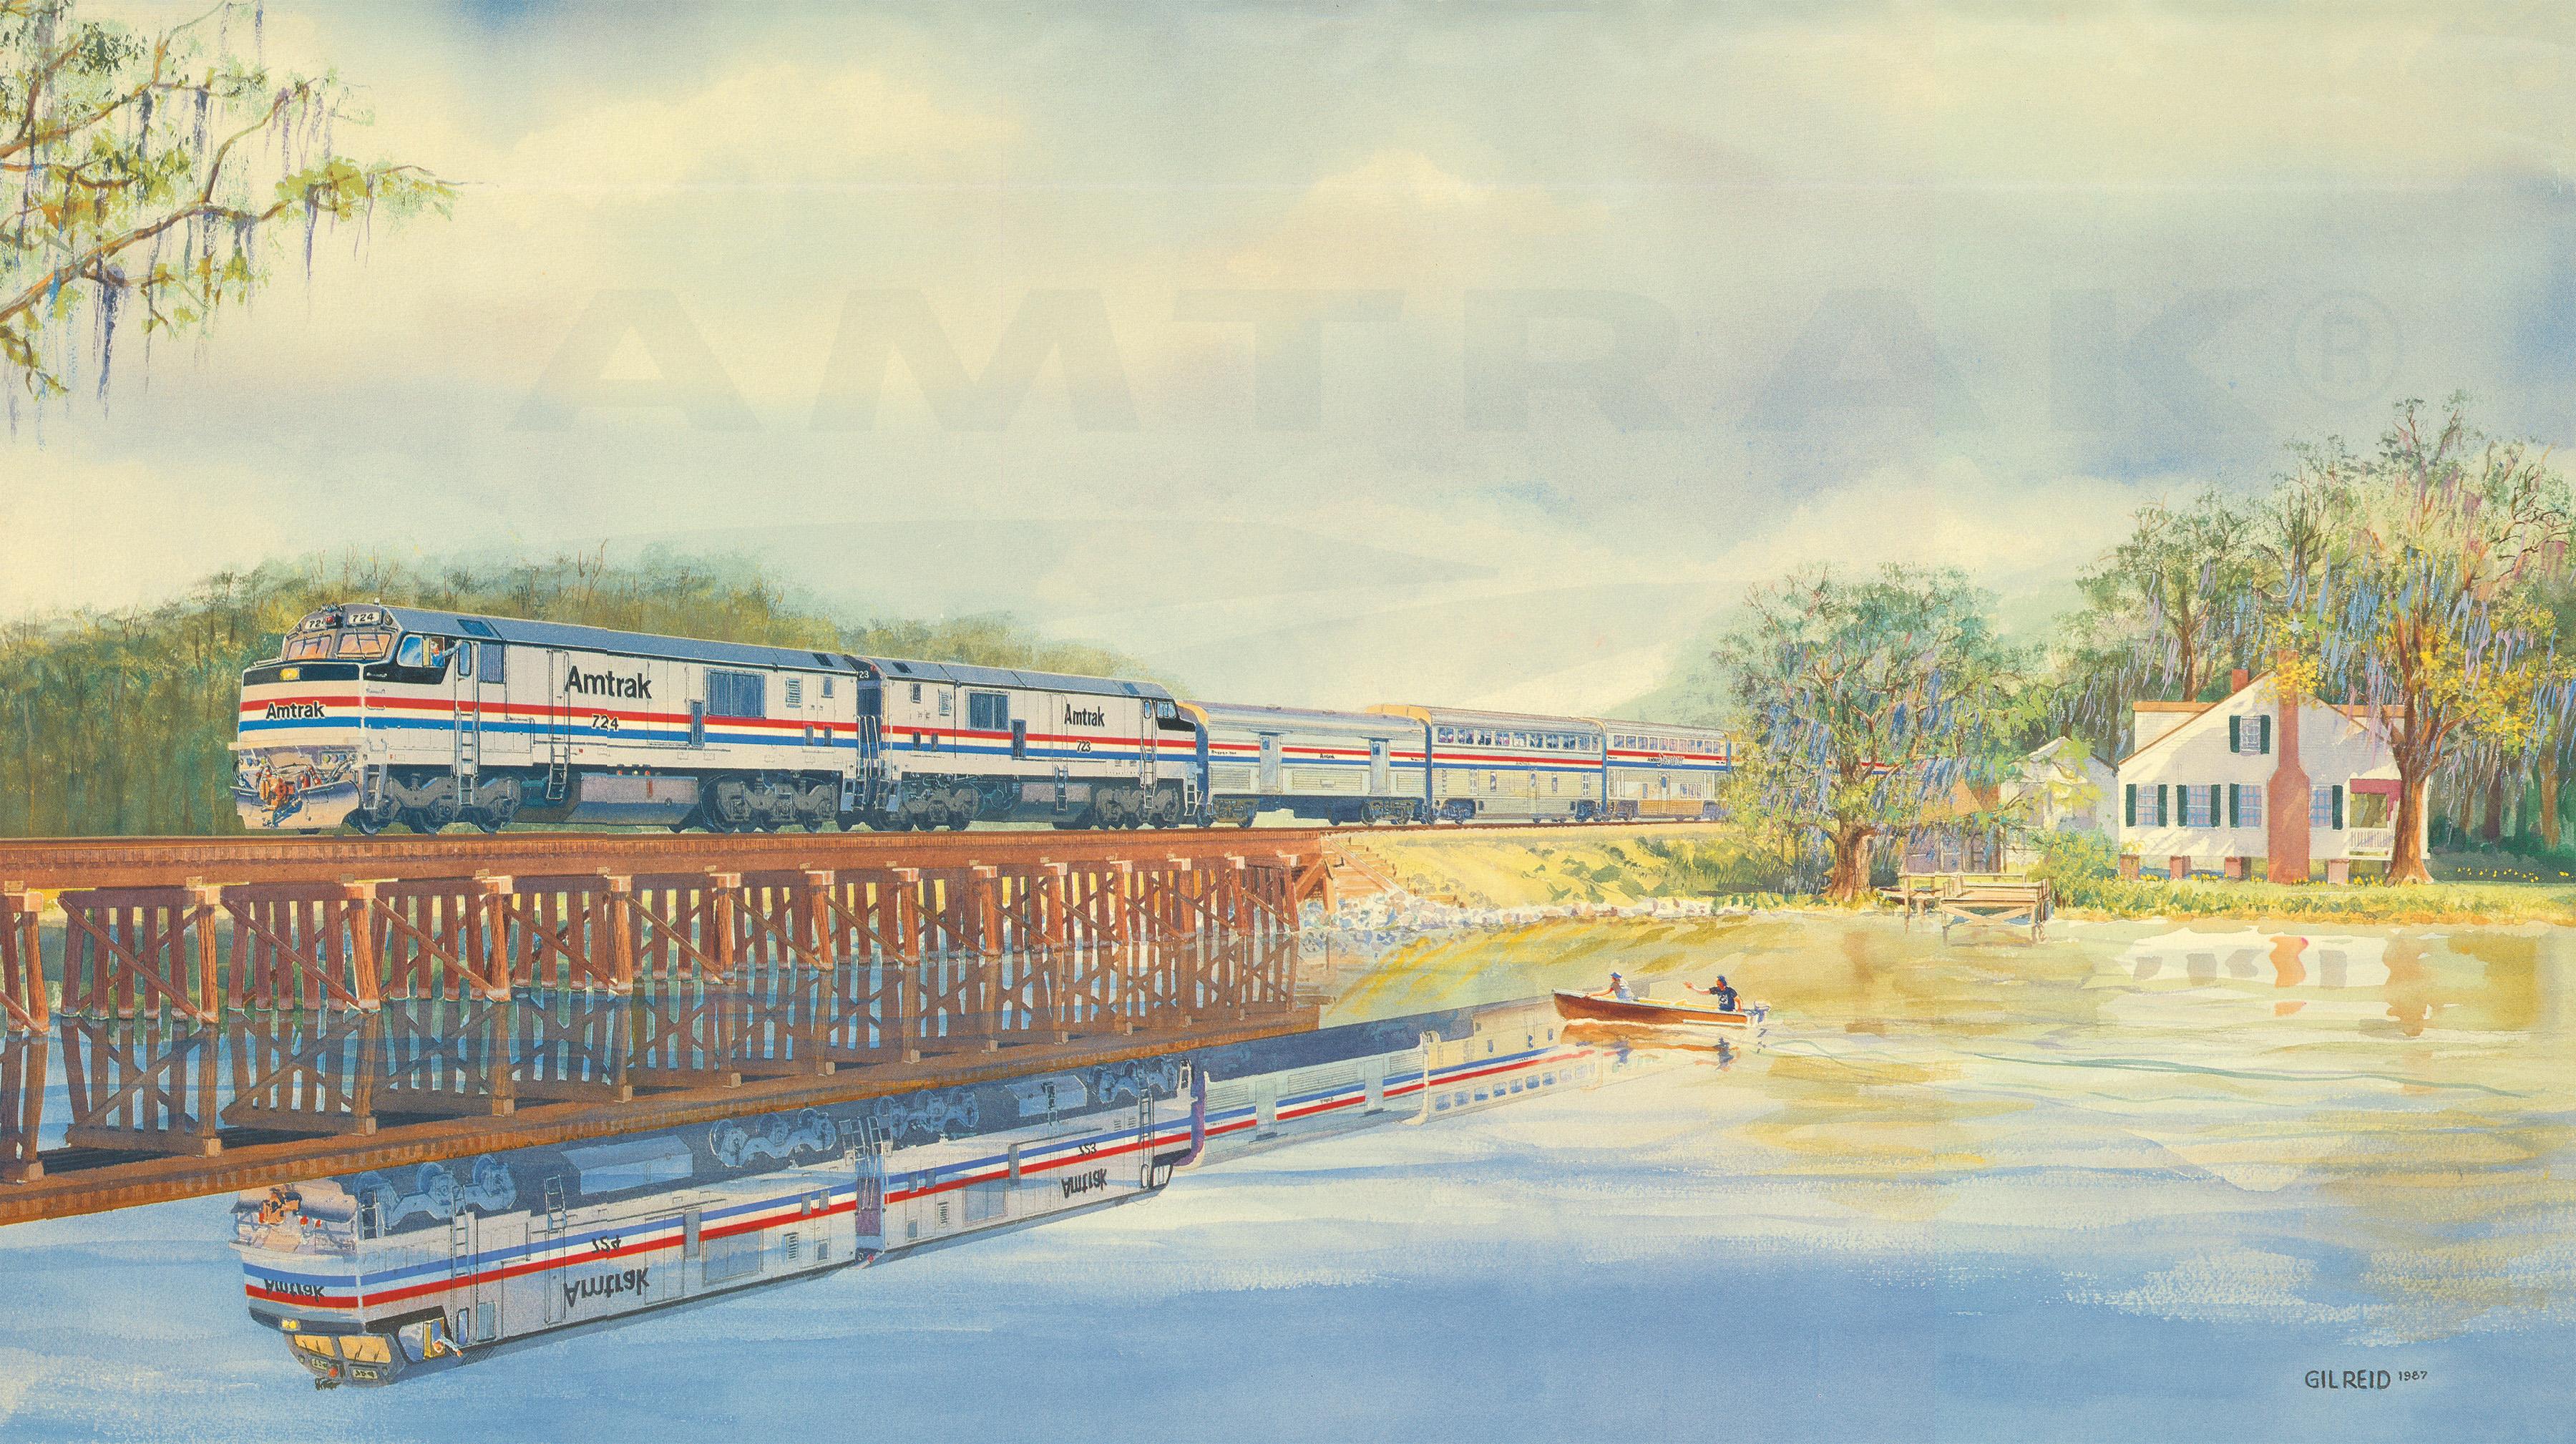 Amtrak Wall Calendar 1988 Amtrak History Of America S